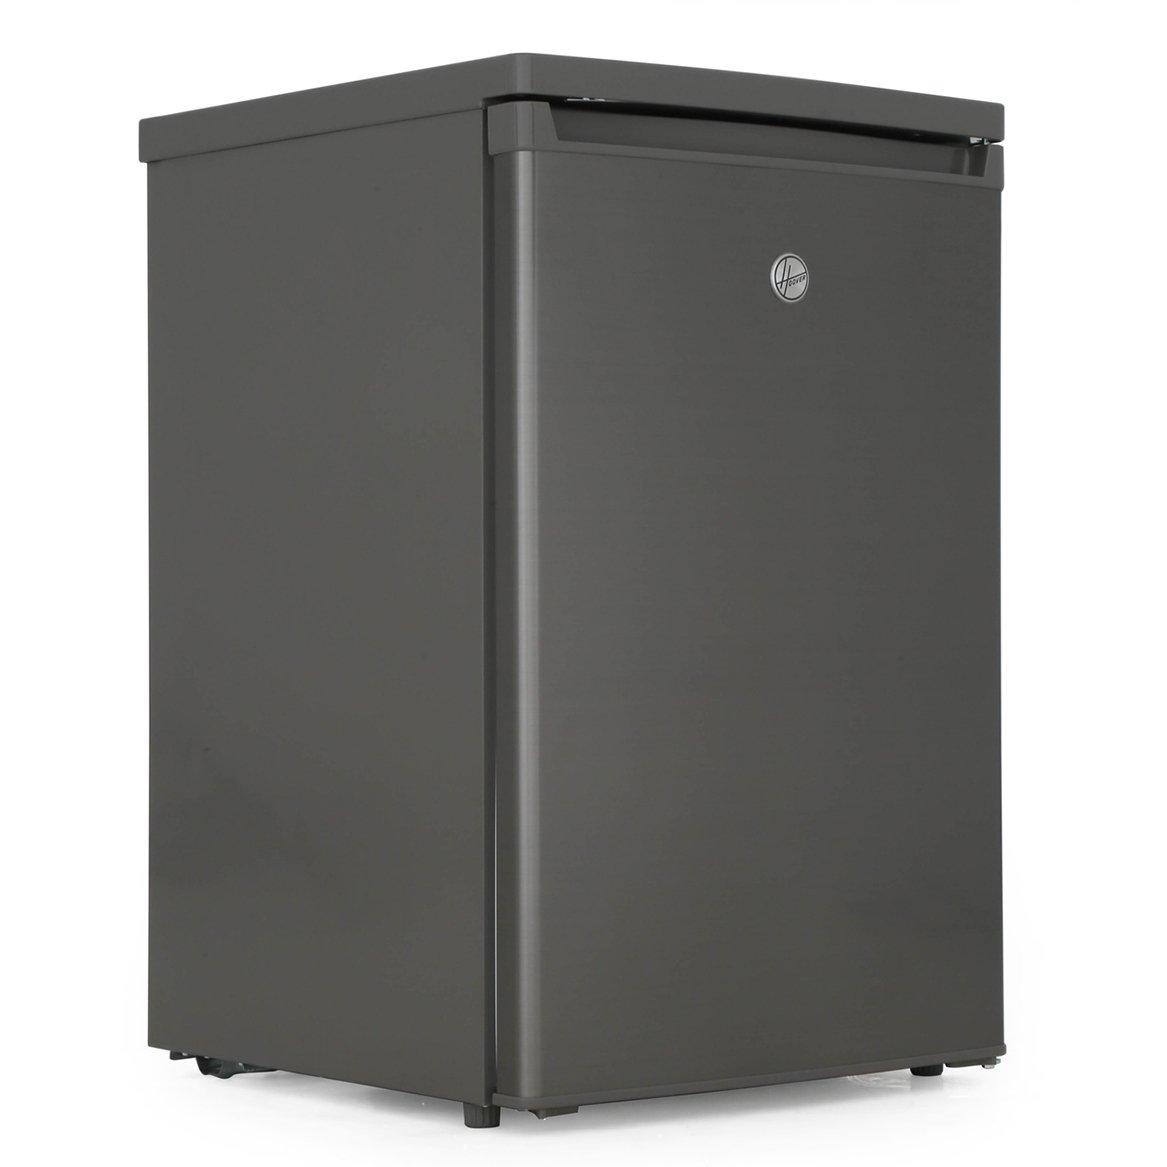 Hoover HFZE54XK Static Freezer